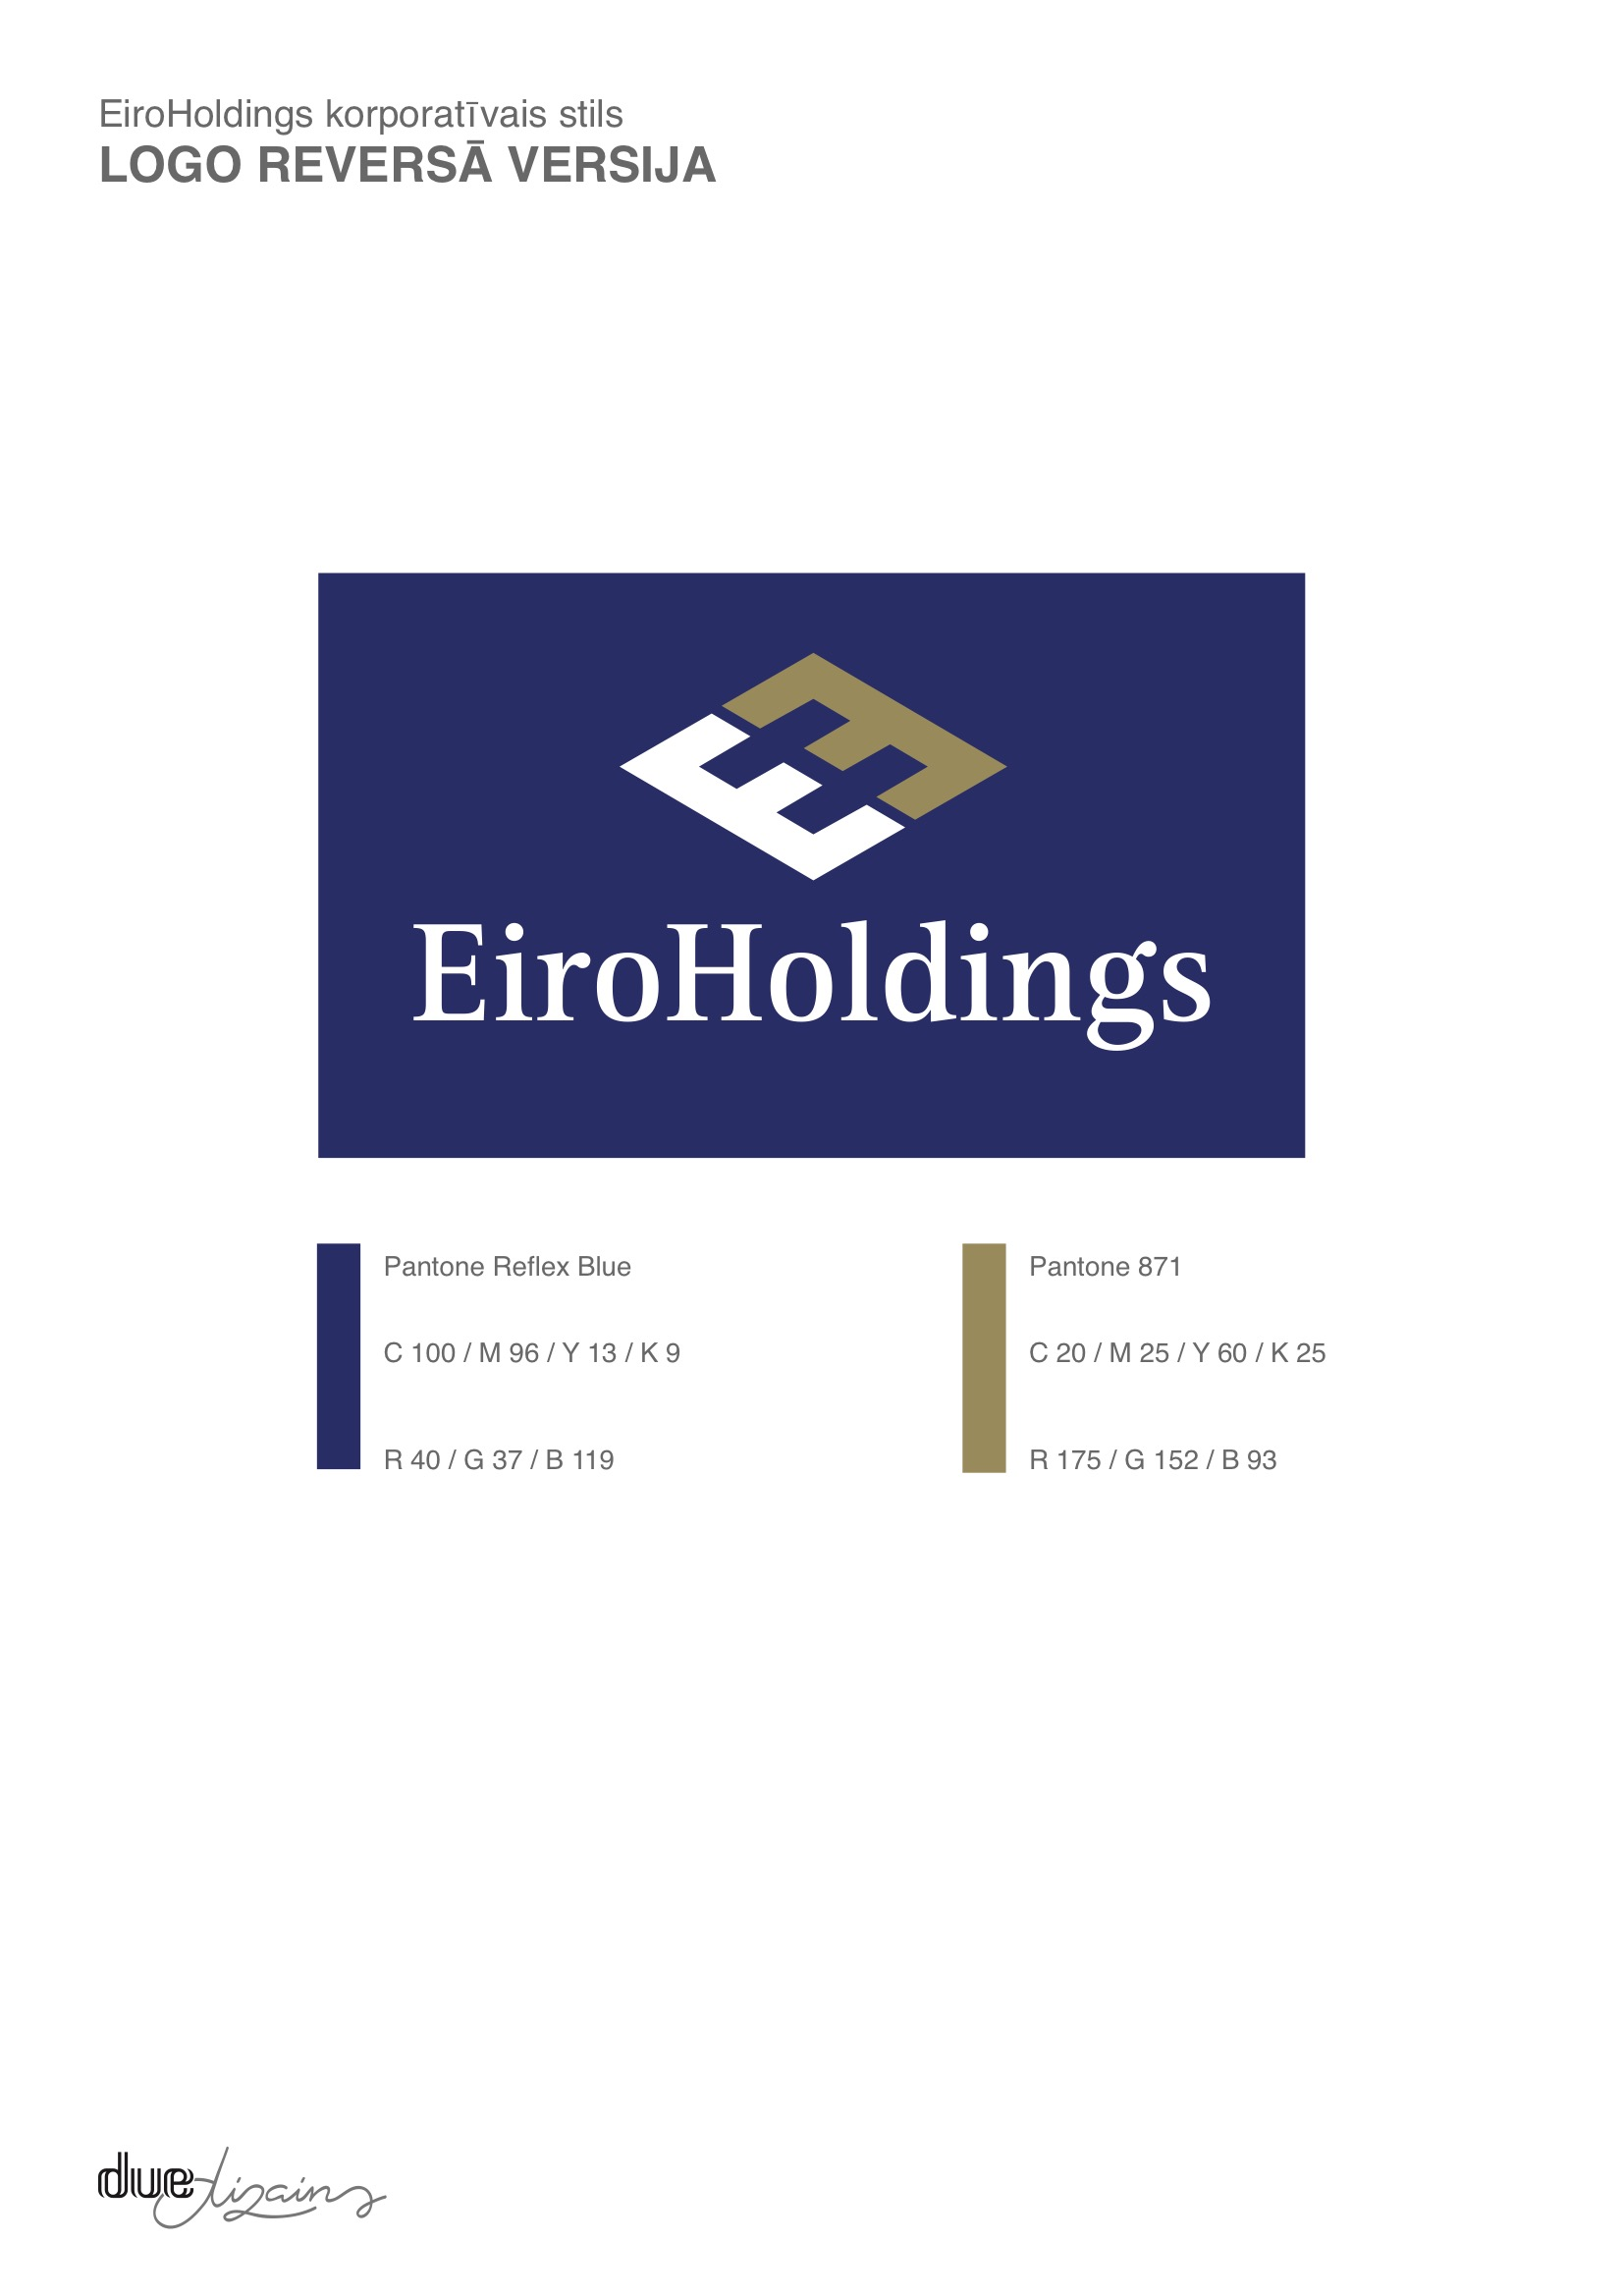 Eiroholdings_logo_guidelines 2